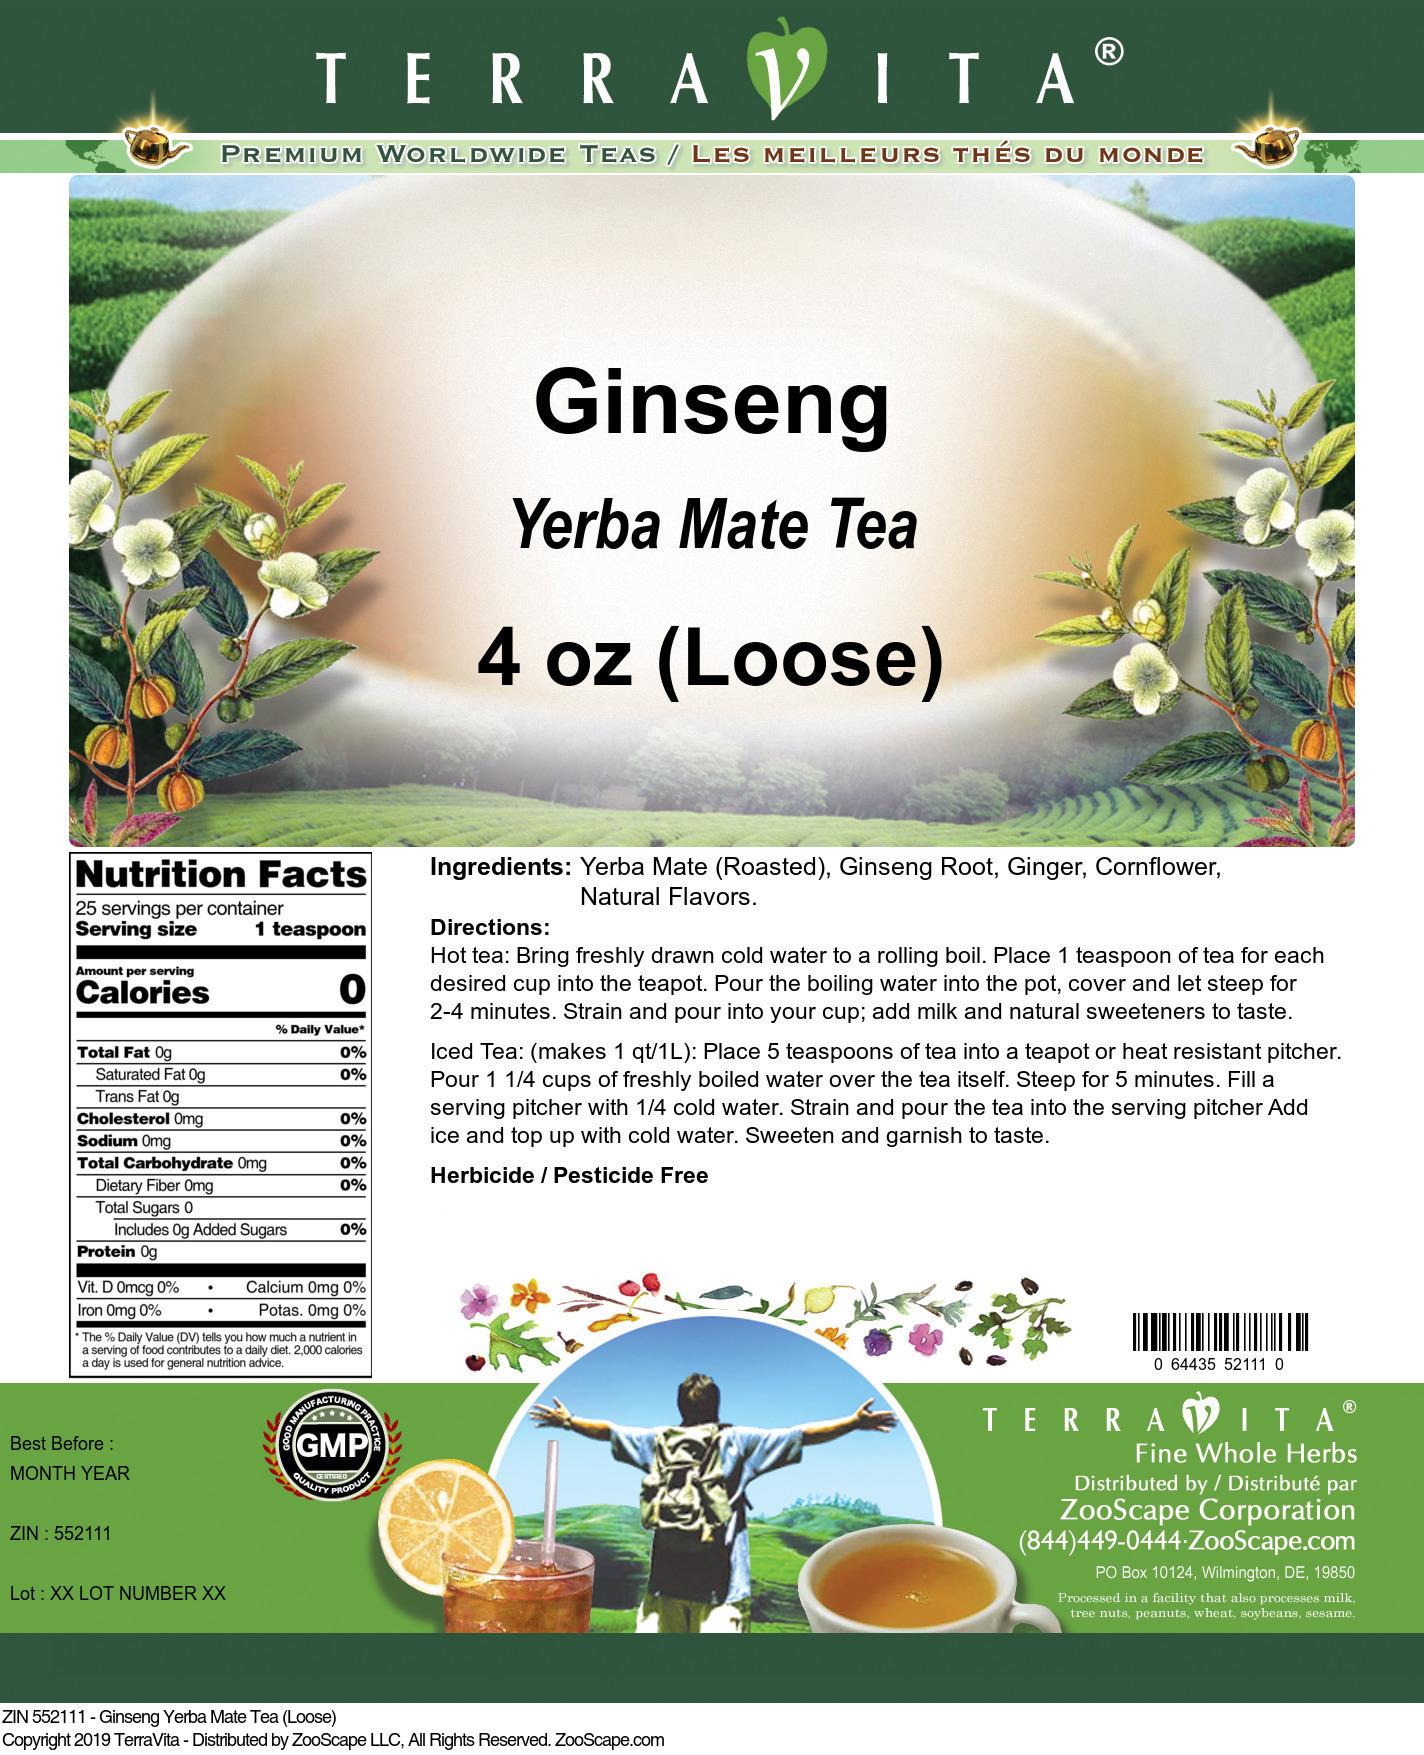 Ginseng Yerba Mate Tea (Loose)